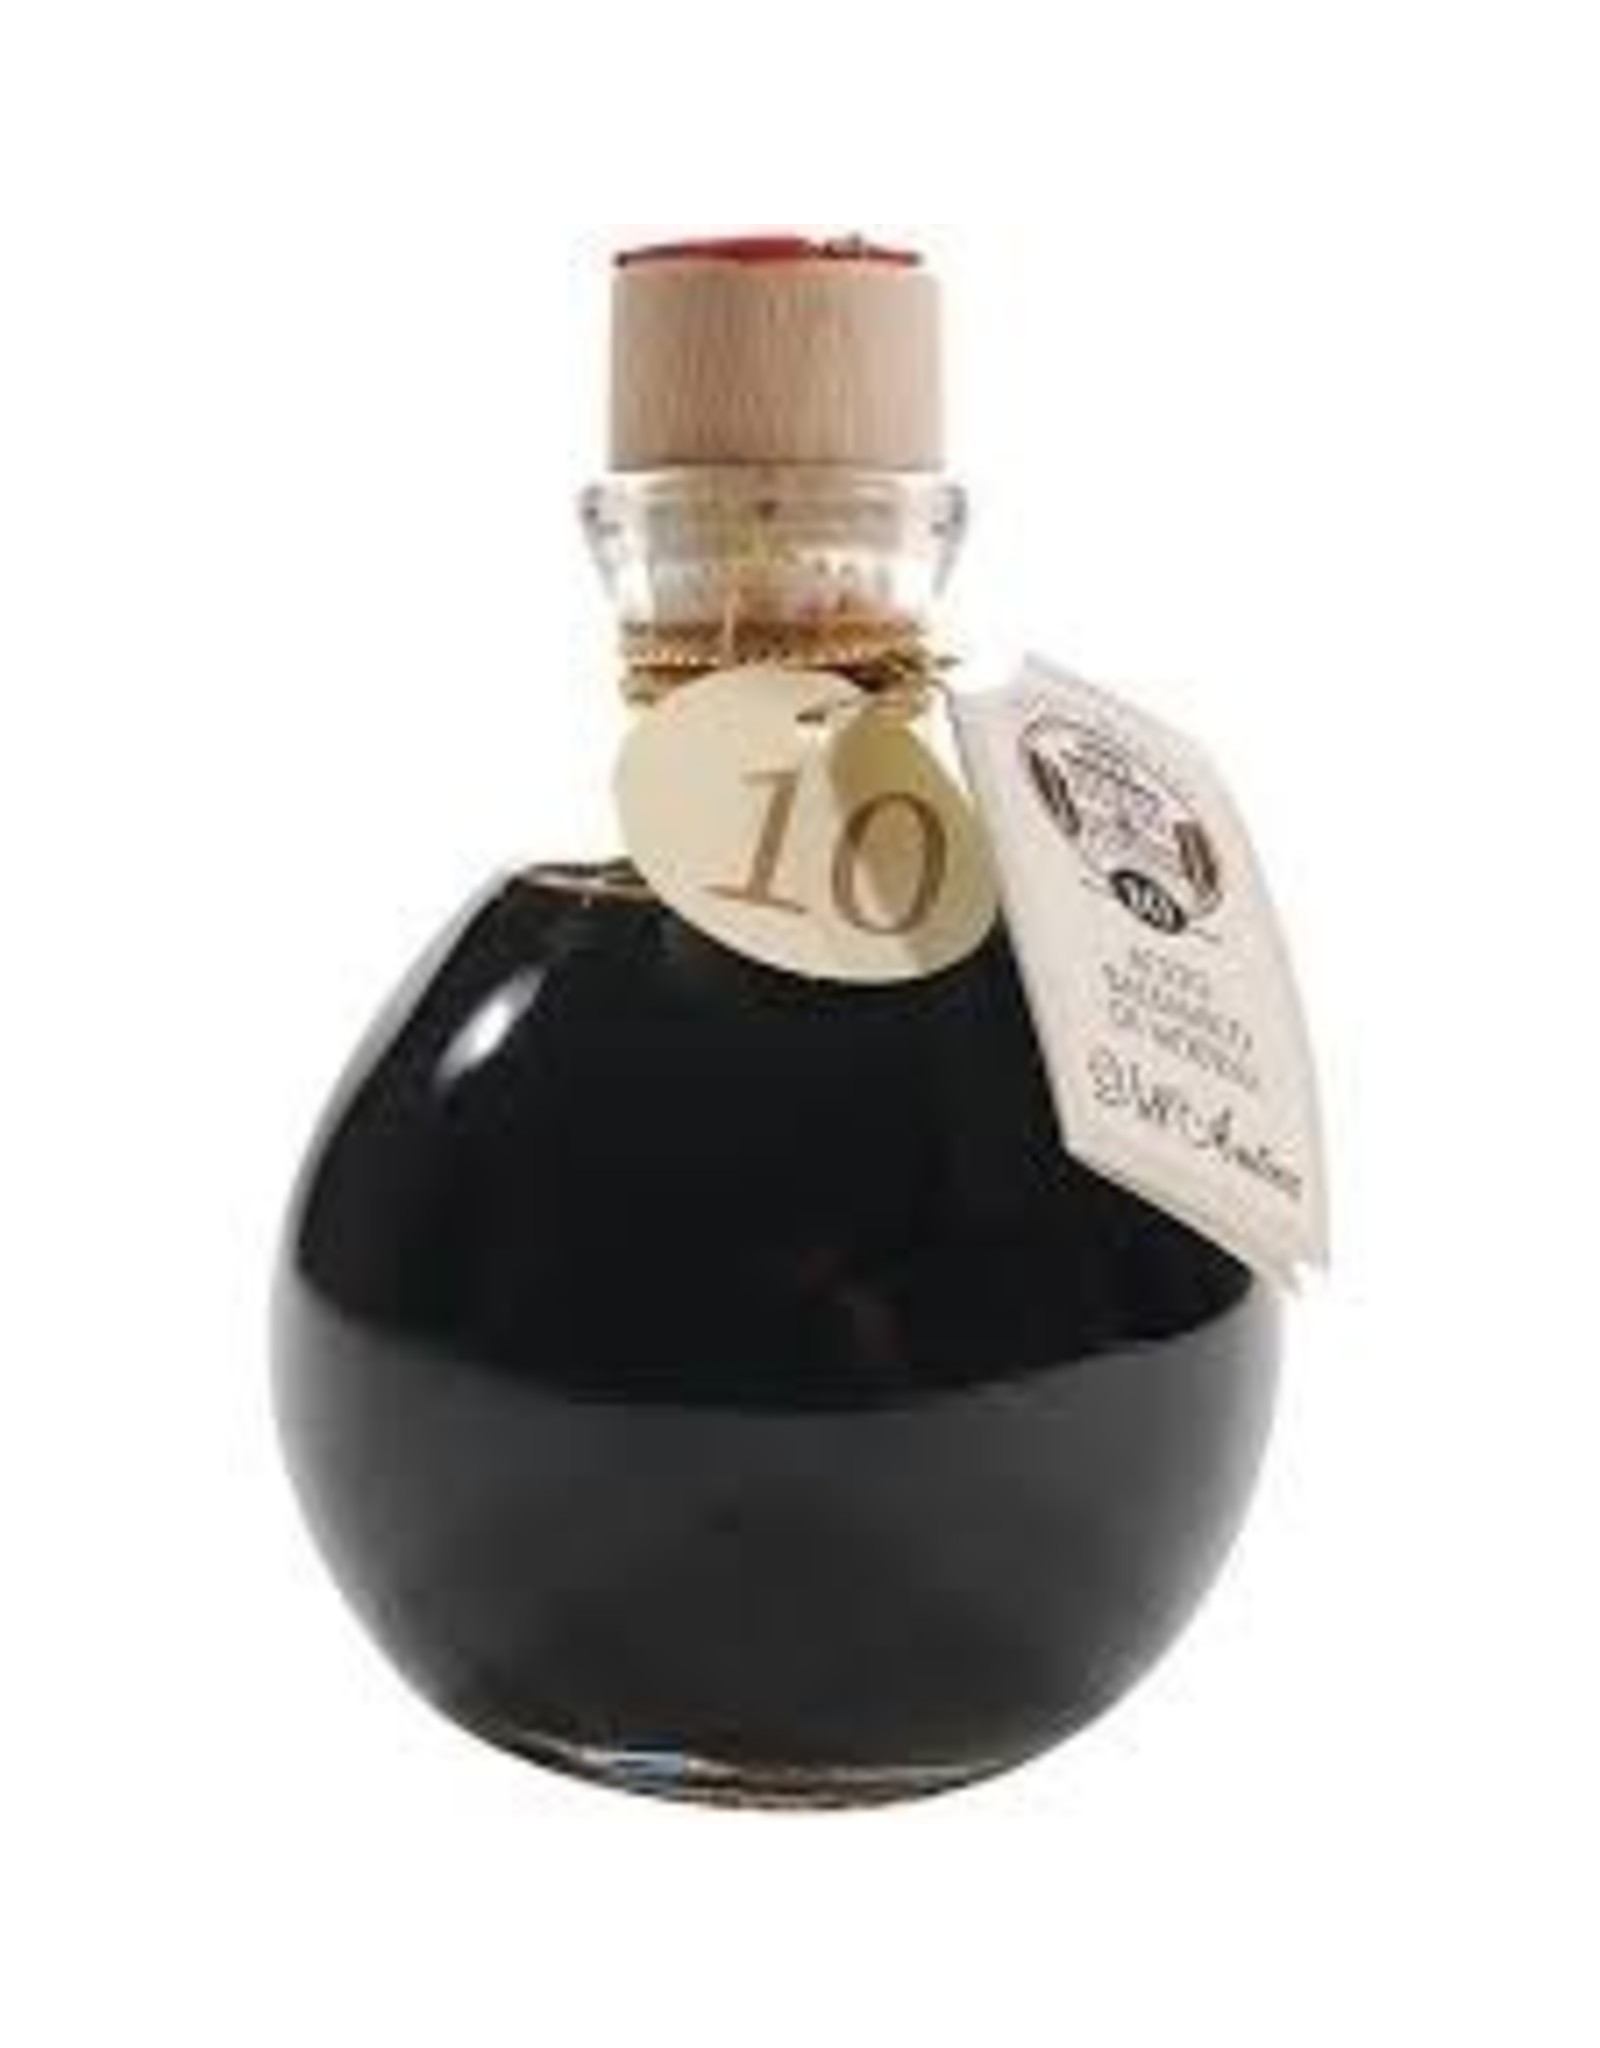 Specialty Foods Vill'Antica,10 Year Old, Aged Balsamic Vinegar, Modena, Italy, 250ml